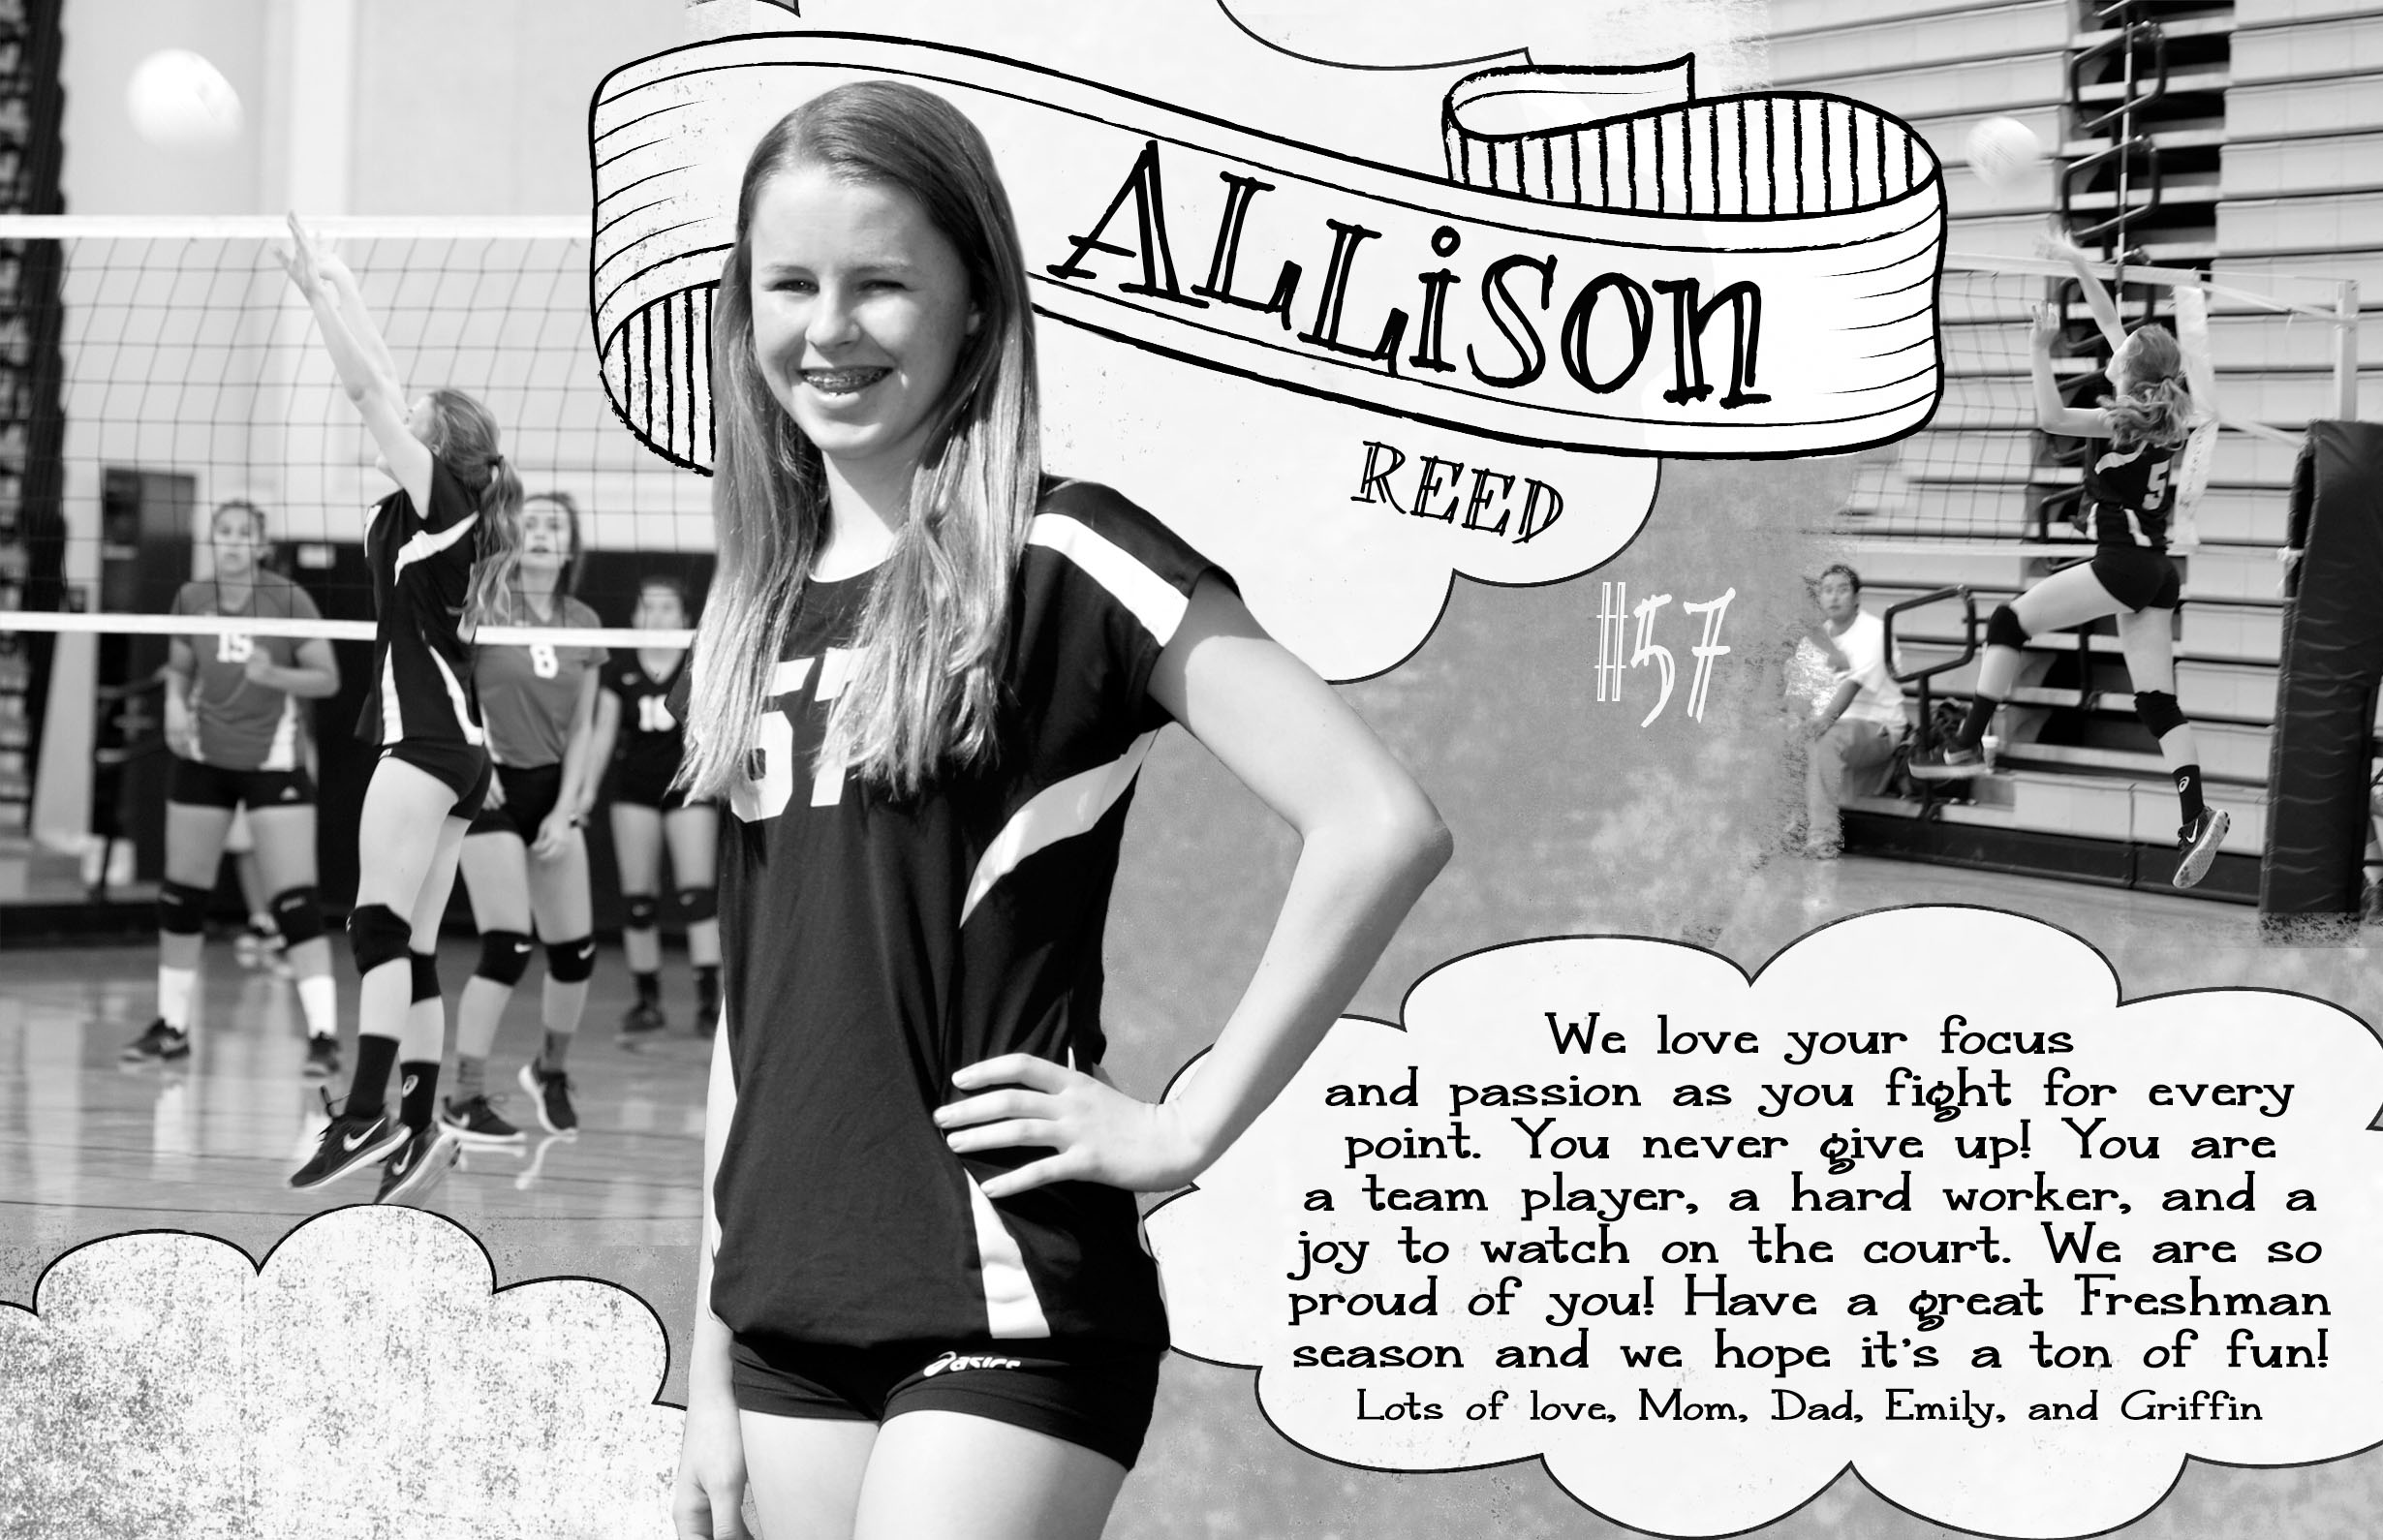 Allison Reed.jpg